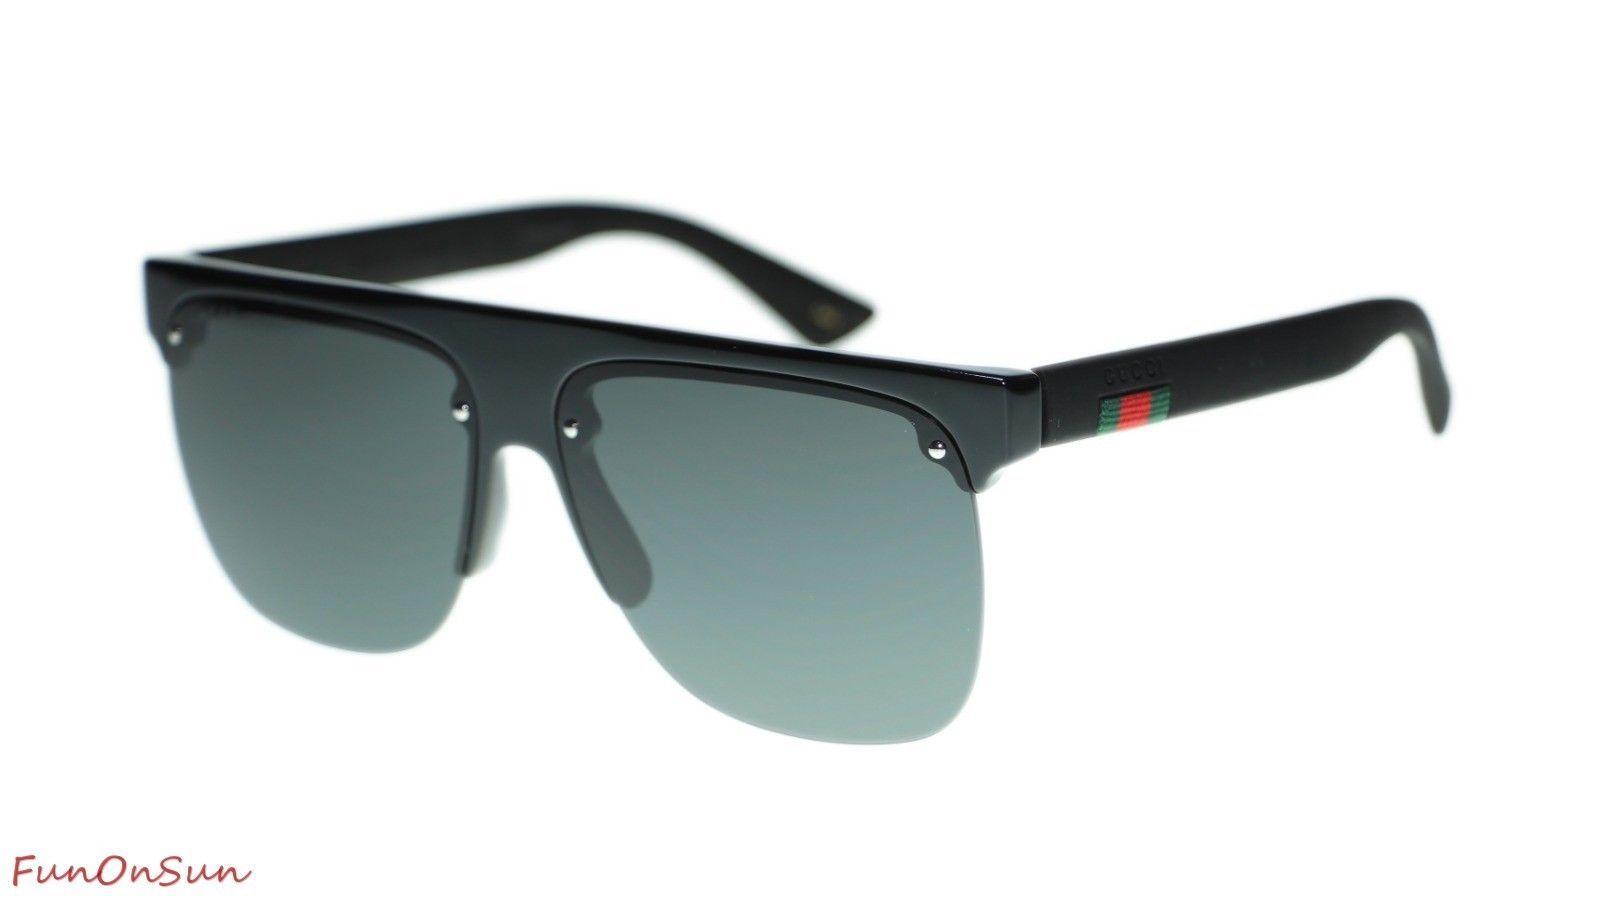 b6480b03d55 10. 10. Previous. NEW Gucci Men Sunglasses GG0171S 002 Black Grey Lens  Pilot 60mm Authentic